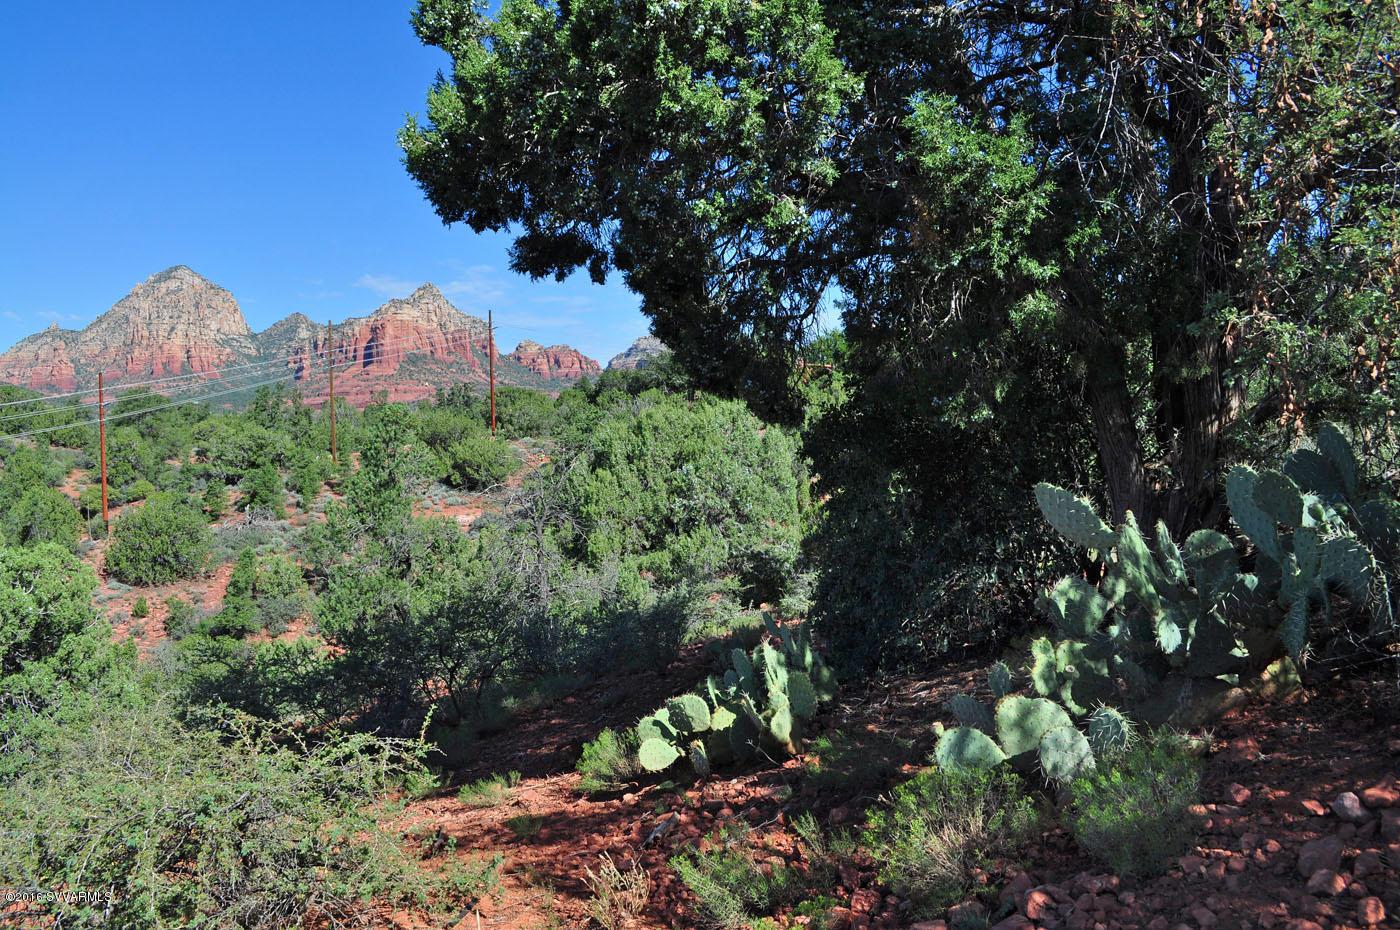 125 Manzanita Sedona, AZ 86336